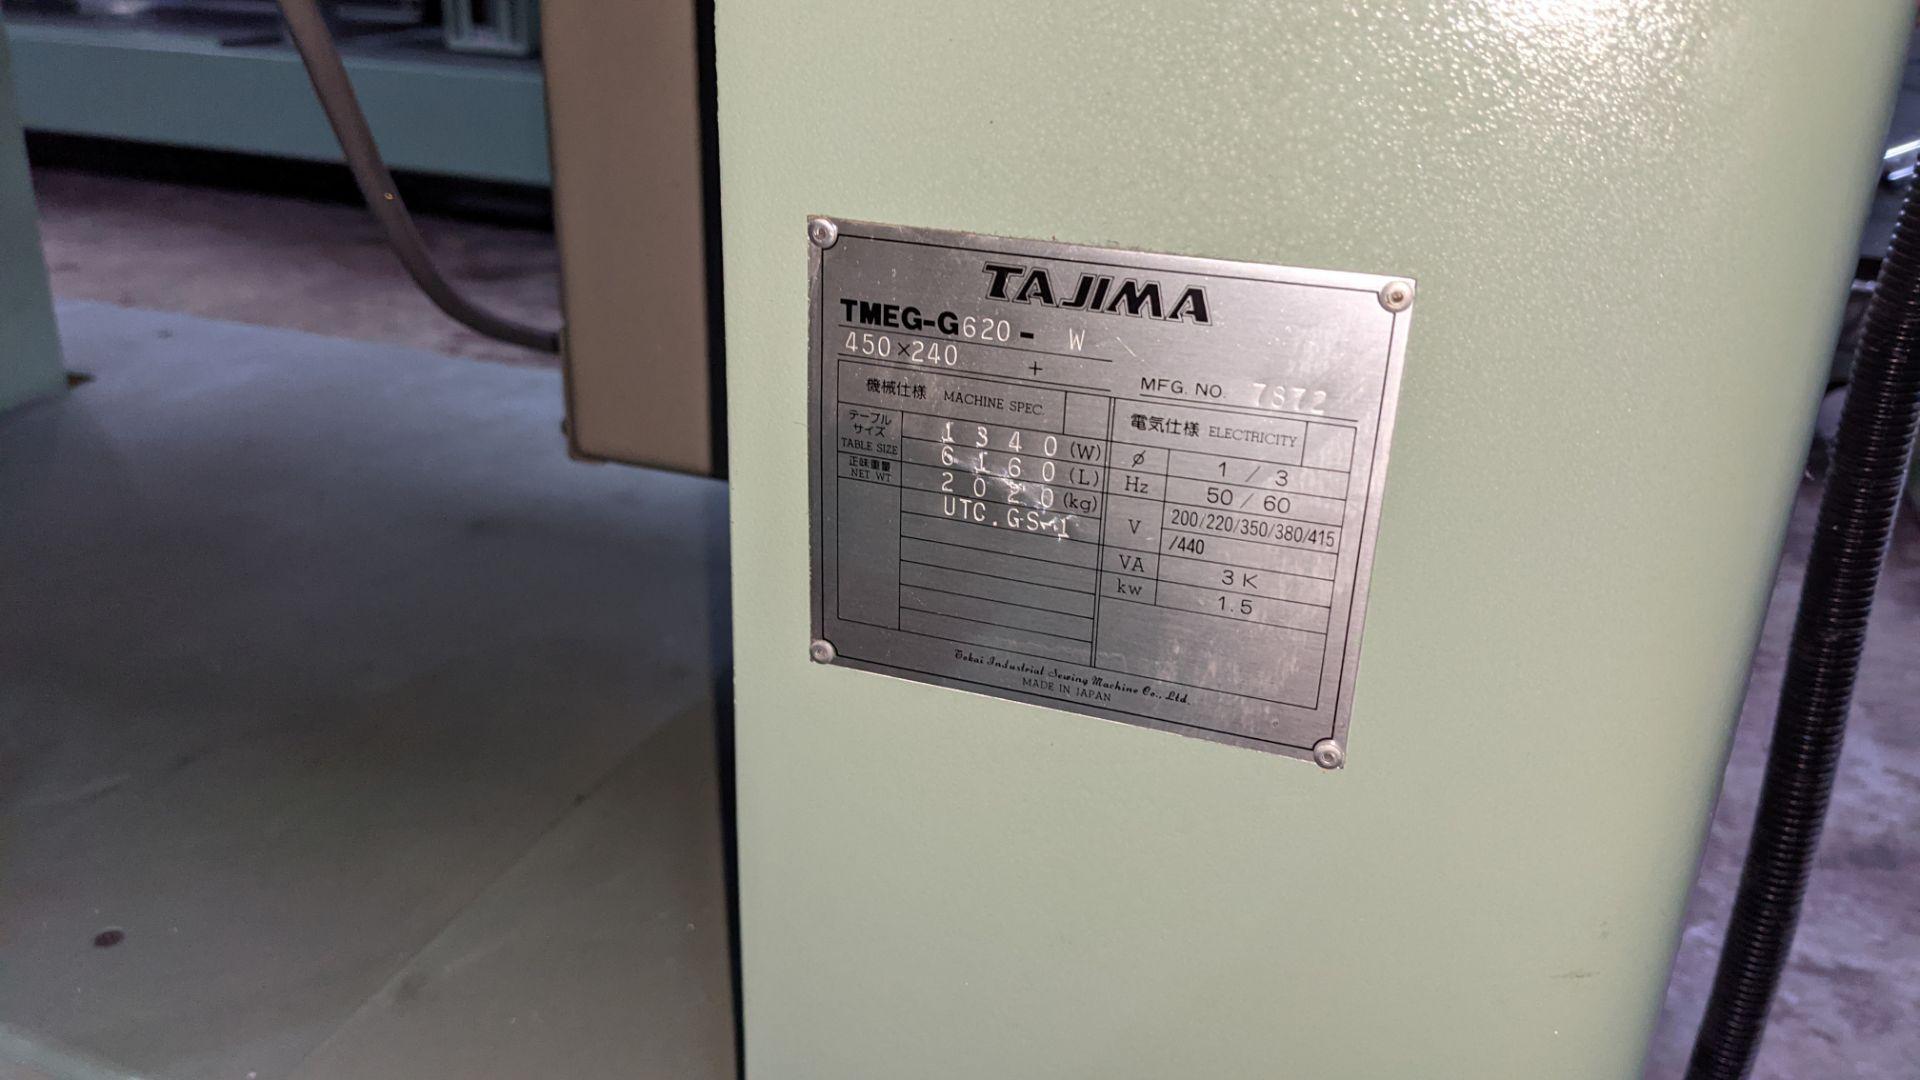 Tokai Tajima electronic 20 head automatic embroidery machine model TMEG-G620, manufacturing number 7 - Image 5 of 19